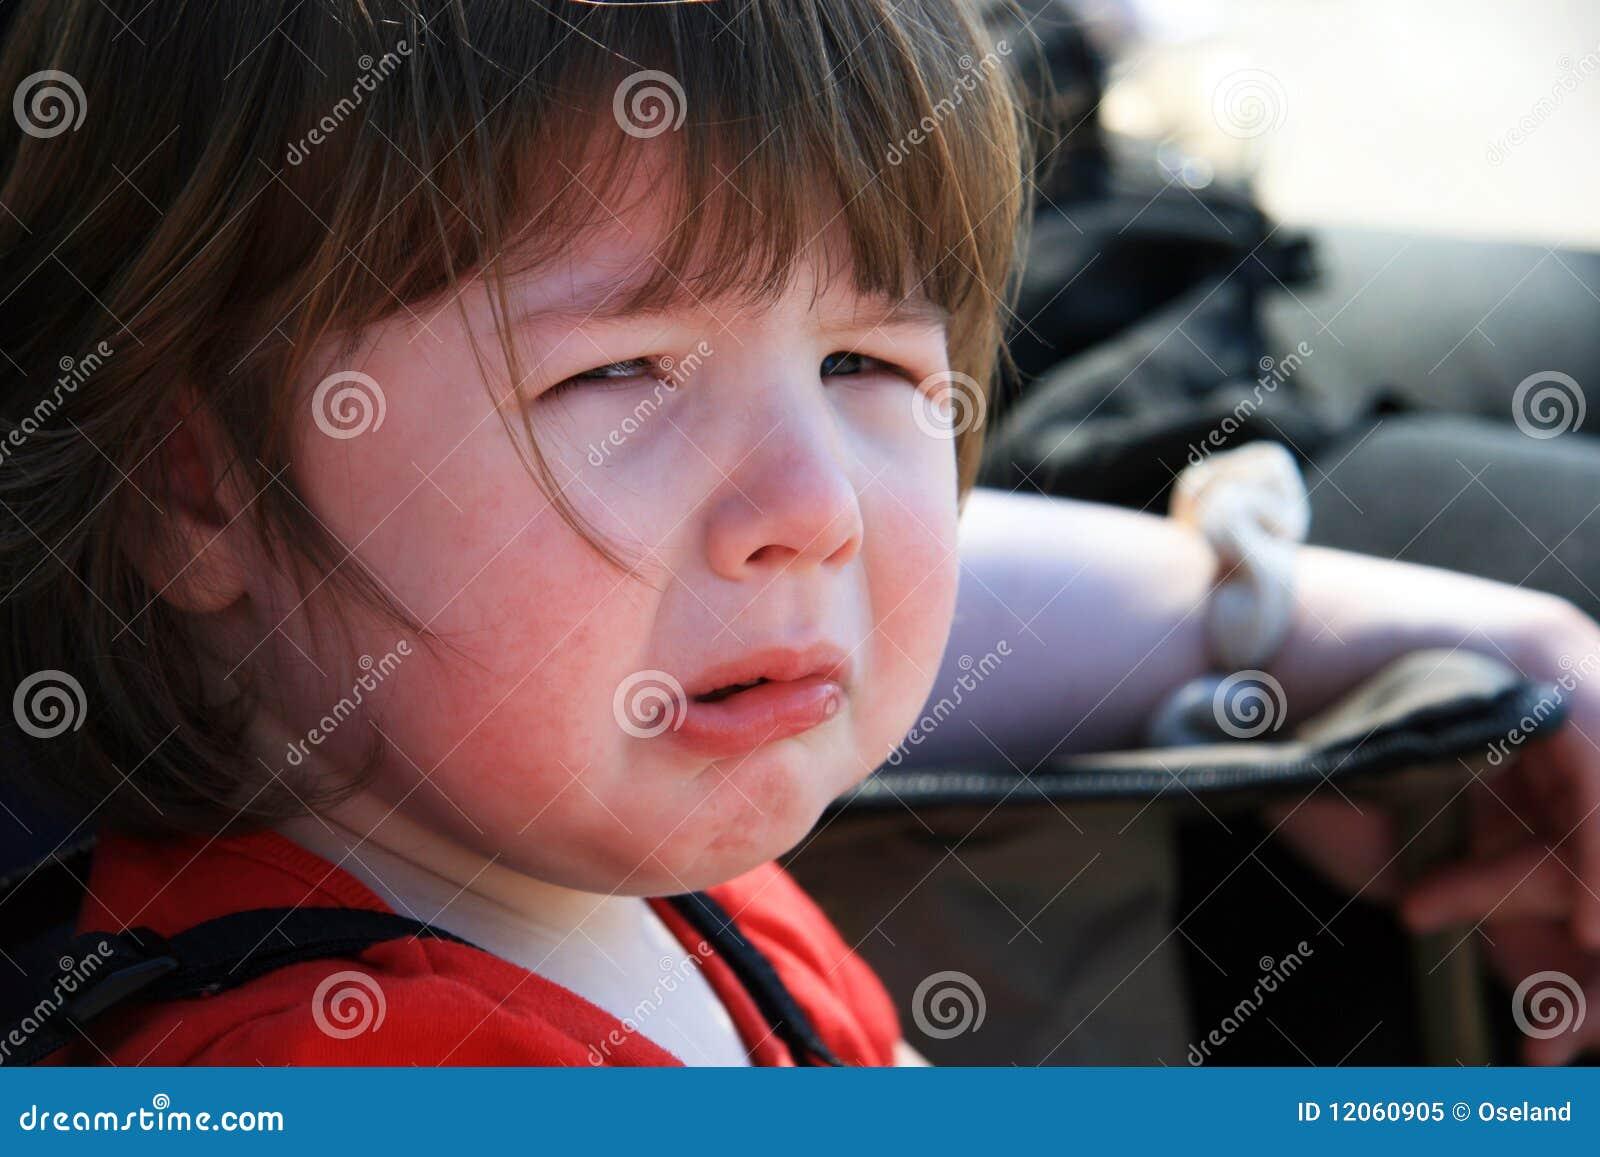 Sad crying little girl royalty free stock photo image - Sad girl pictures crying ...